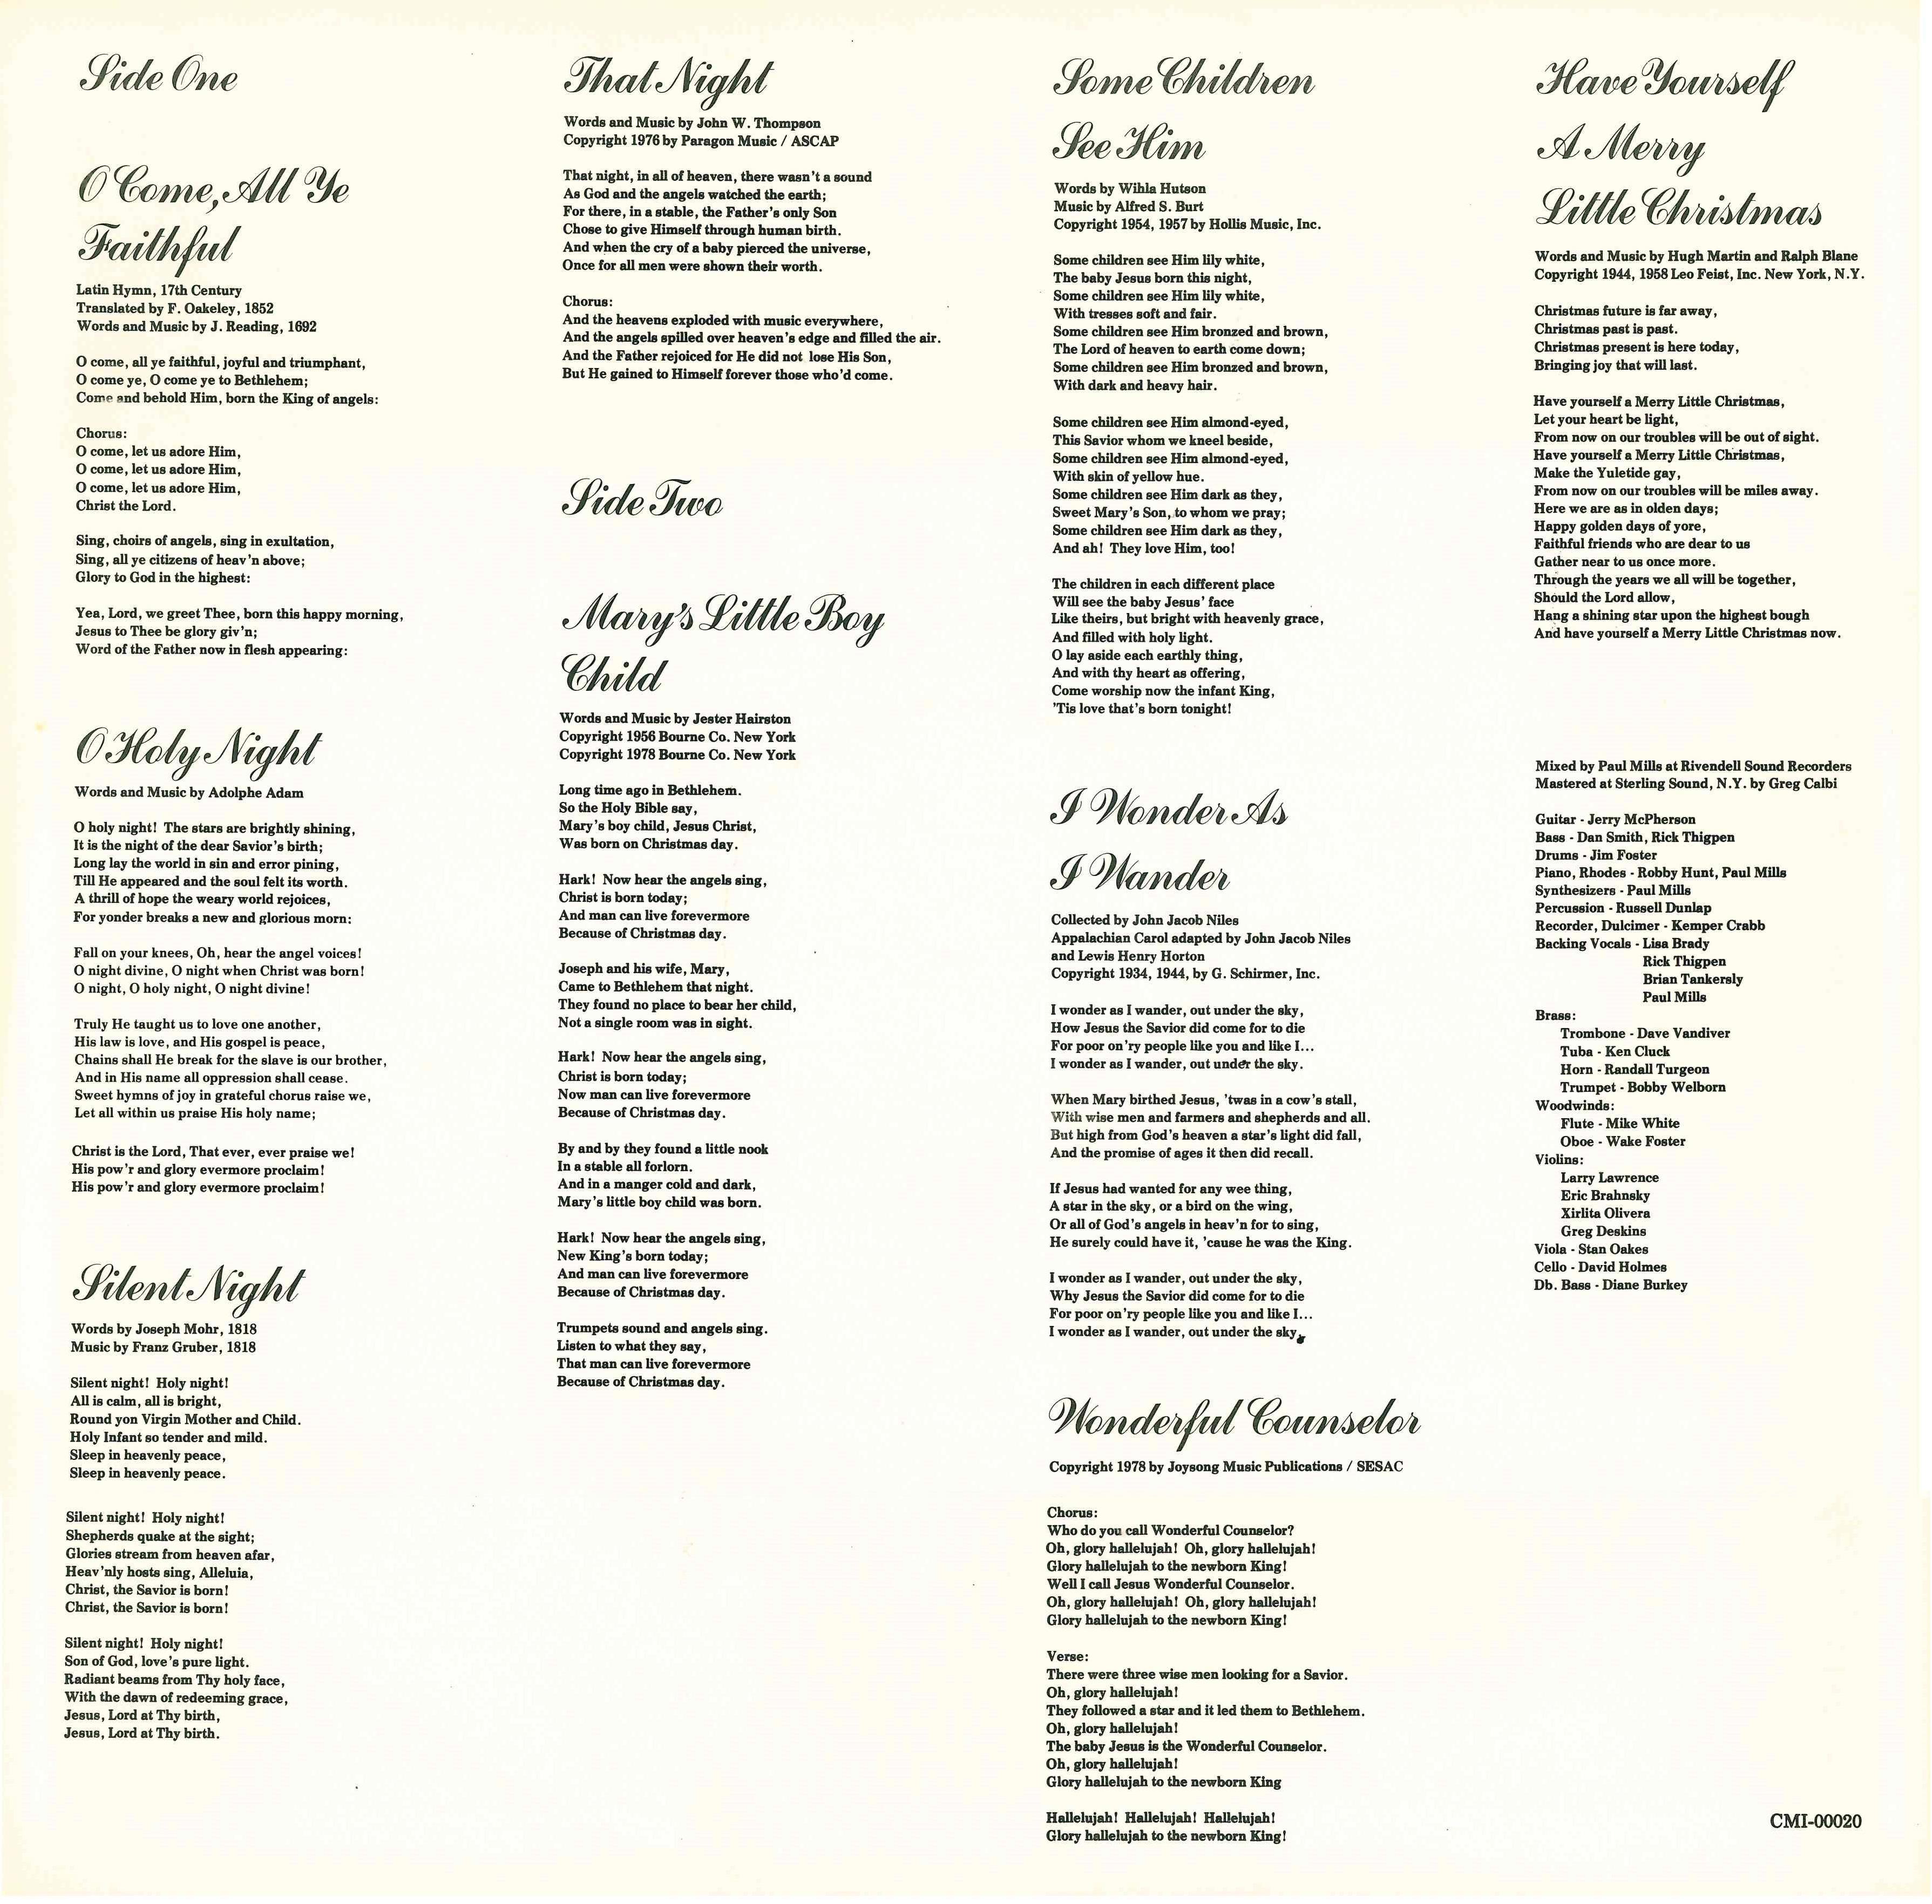 front cover back cover lyrics - Christmas Hallelujah Lyrics